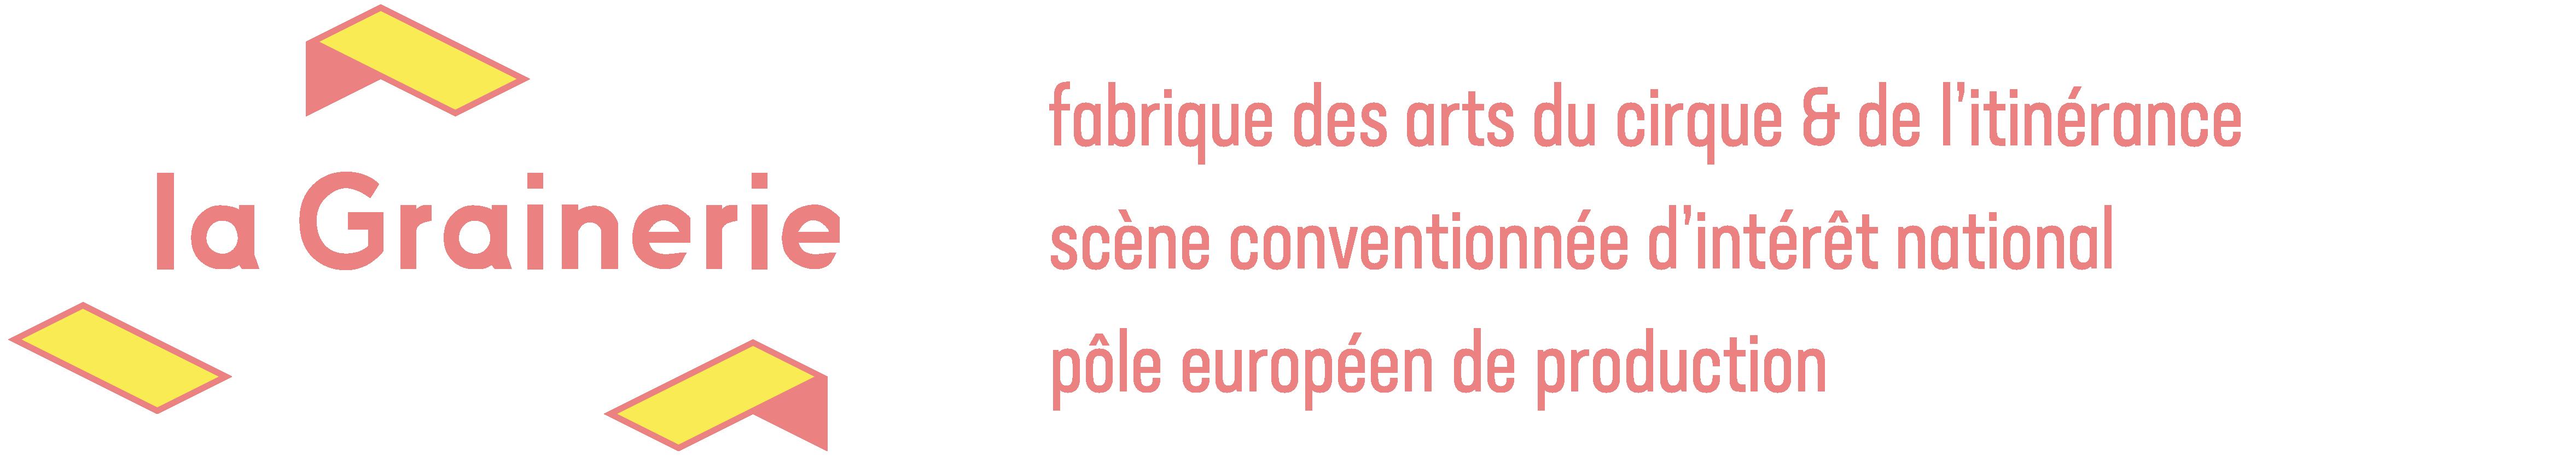 logo La Grainerie